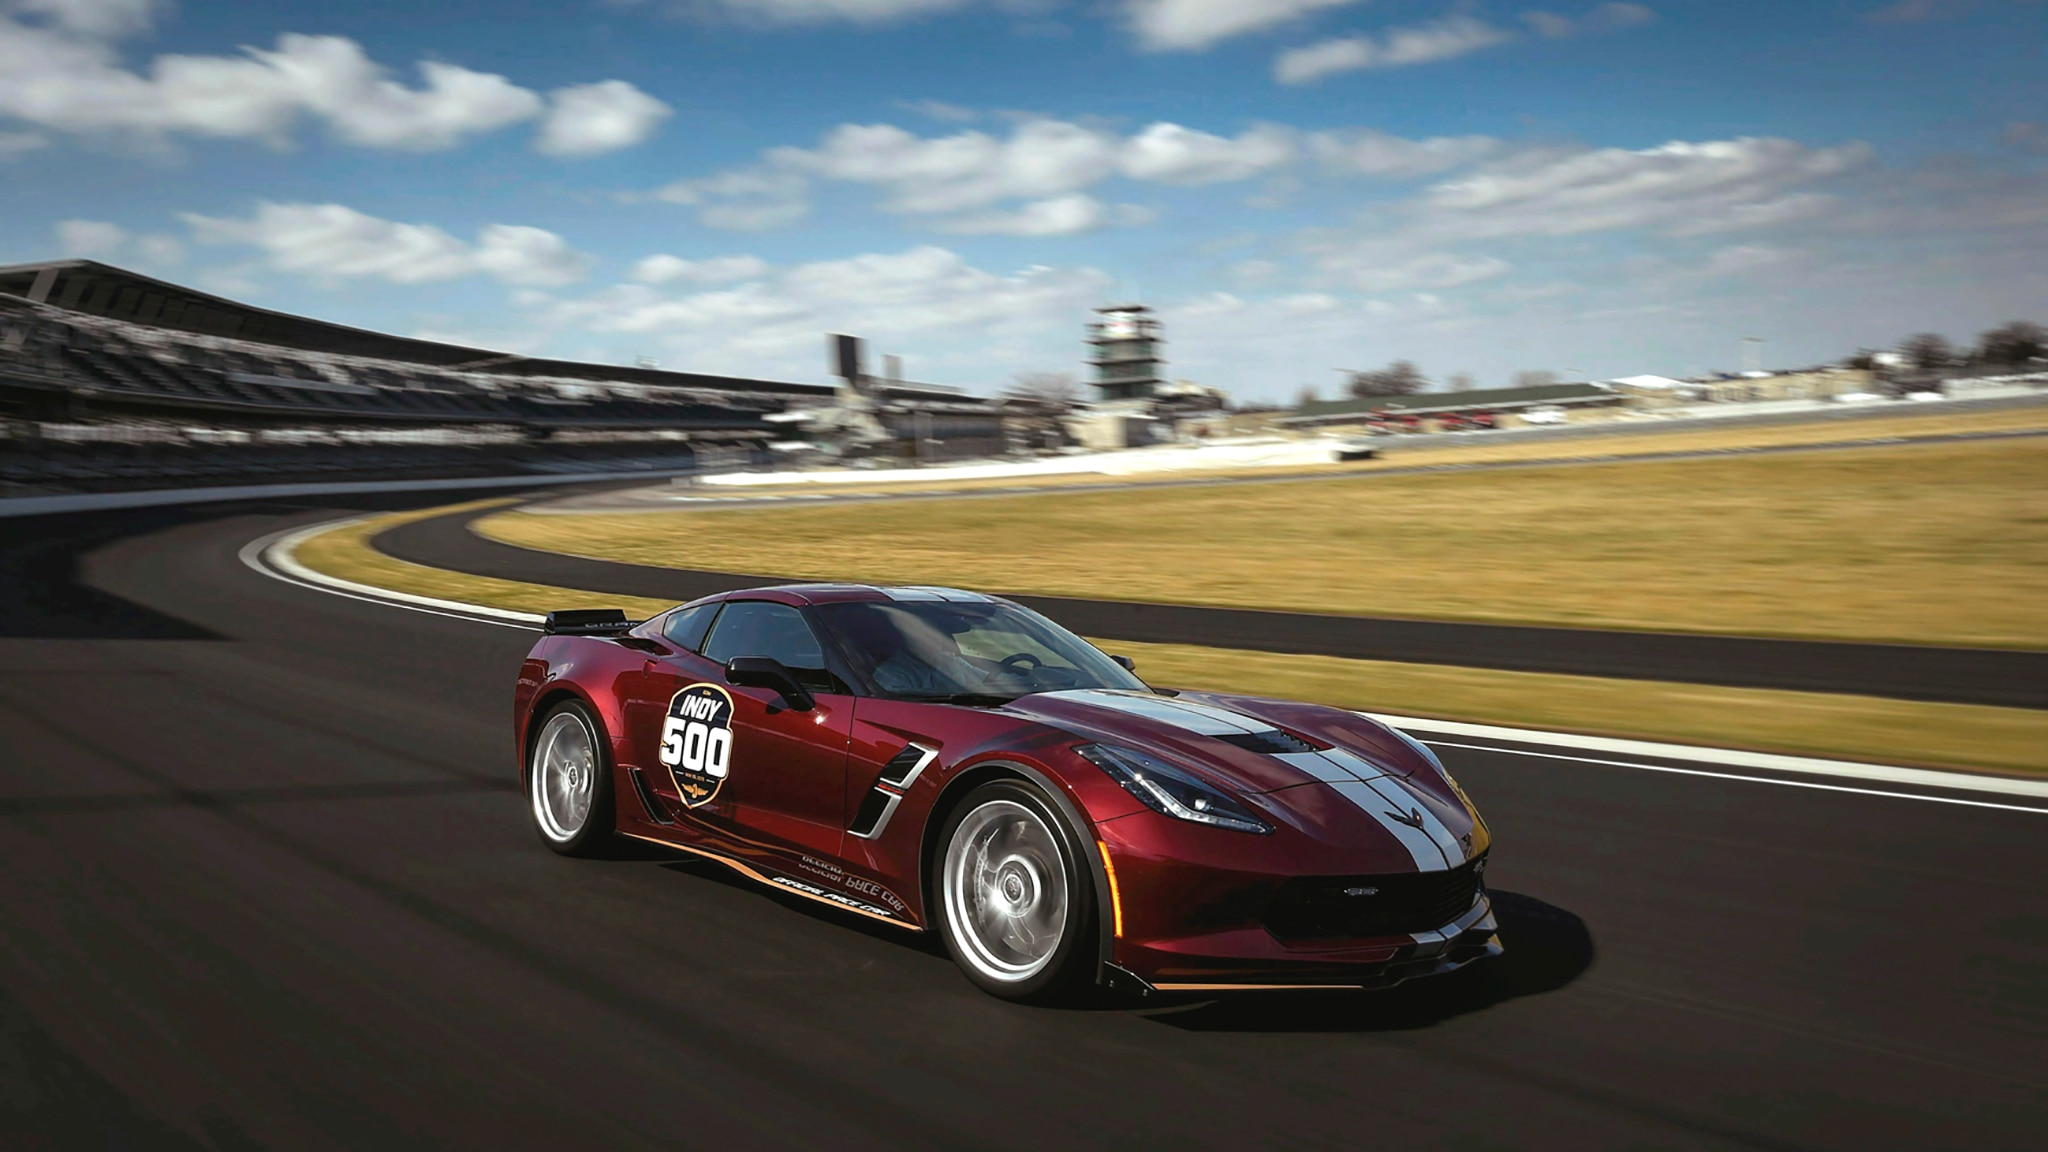 2019 Indy500 Corvette GrandSport PaceCar 02